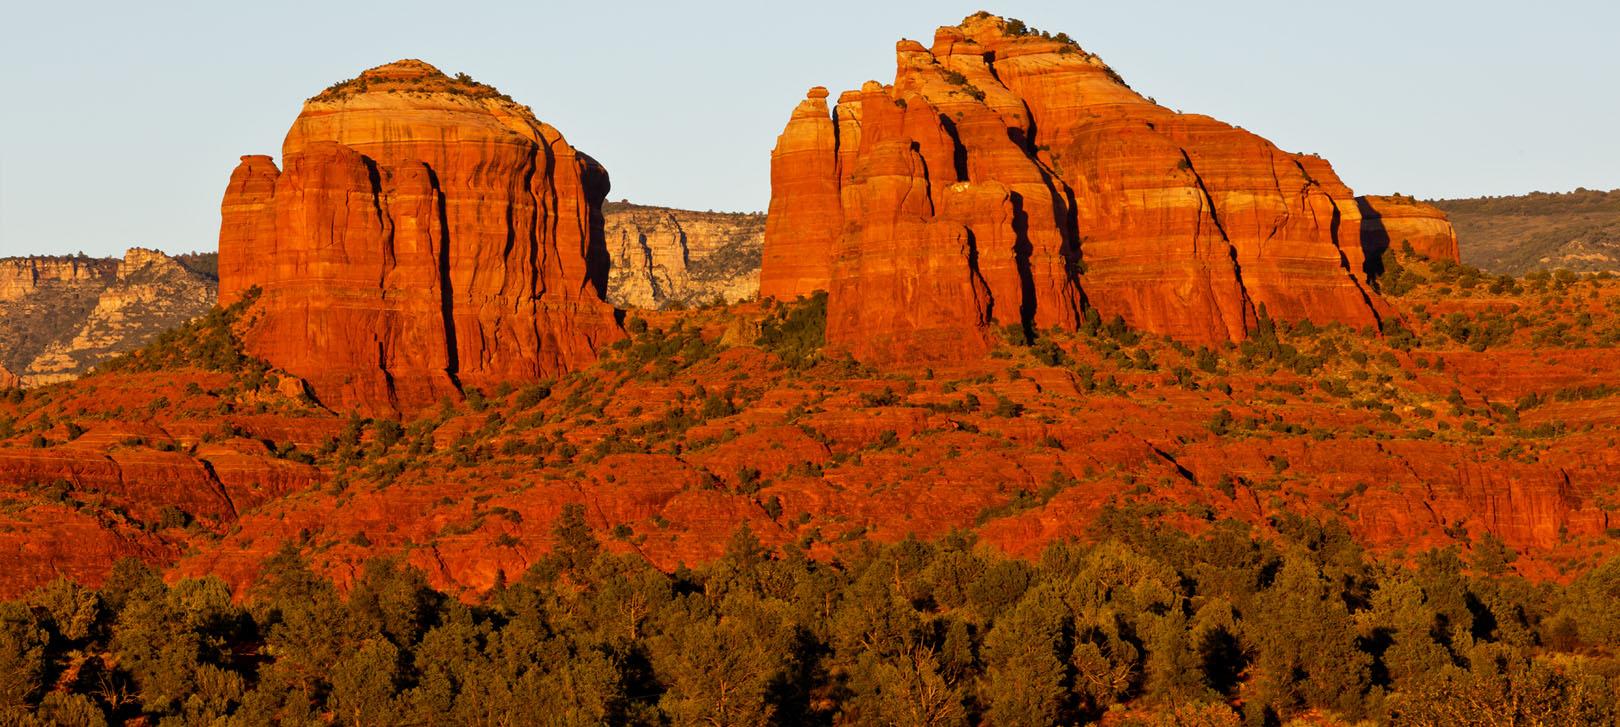 The Great Arizona to Las Vegas Road Trip Guide